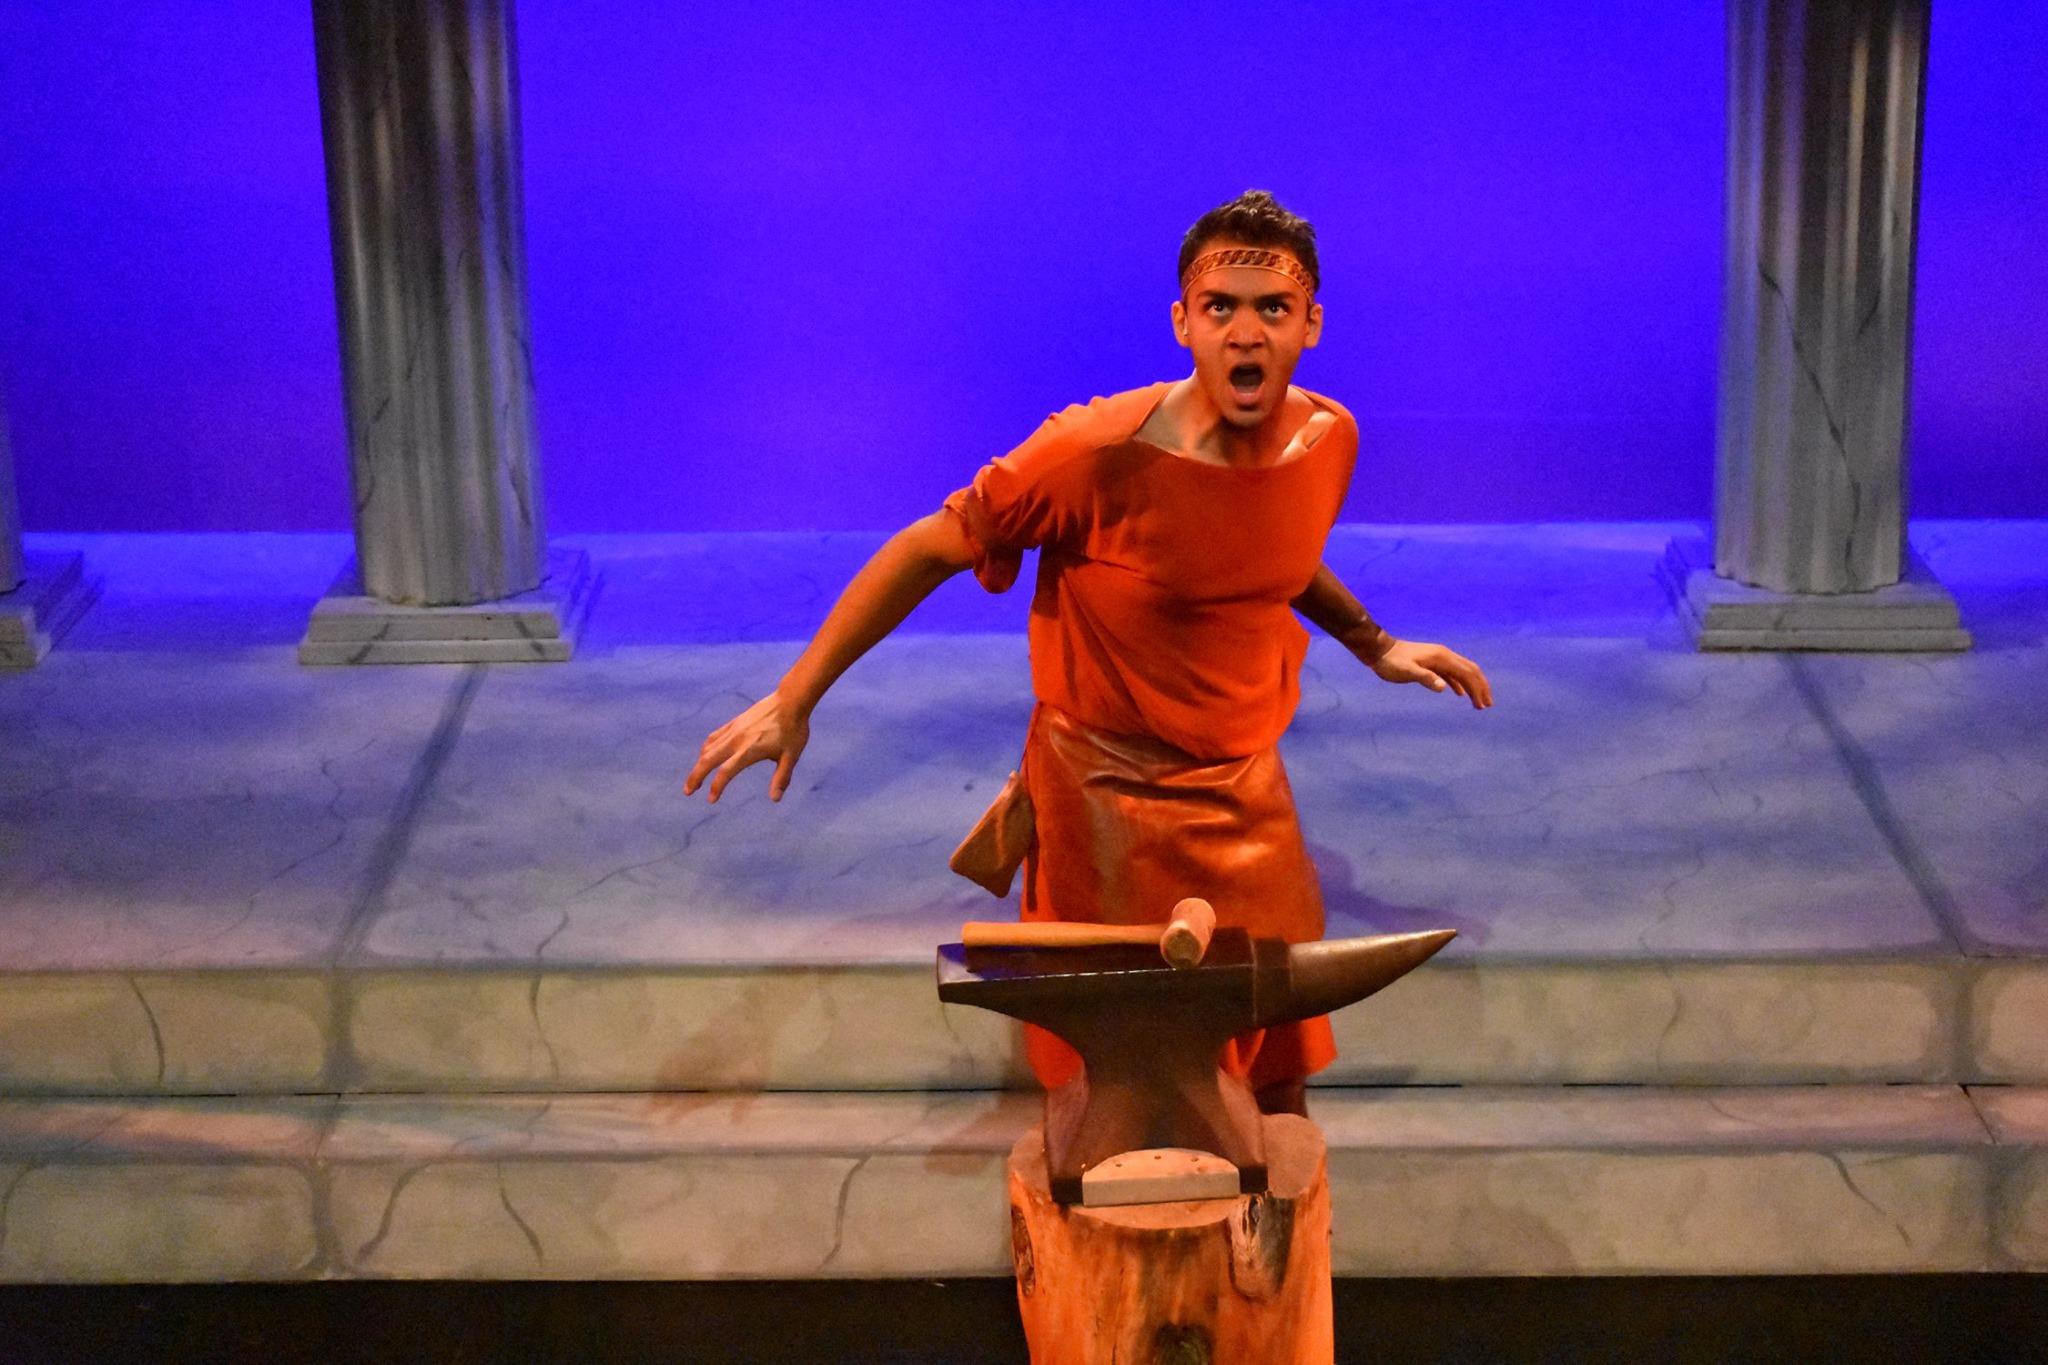 Caleb Mathura at his forge as Hephaestus.